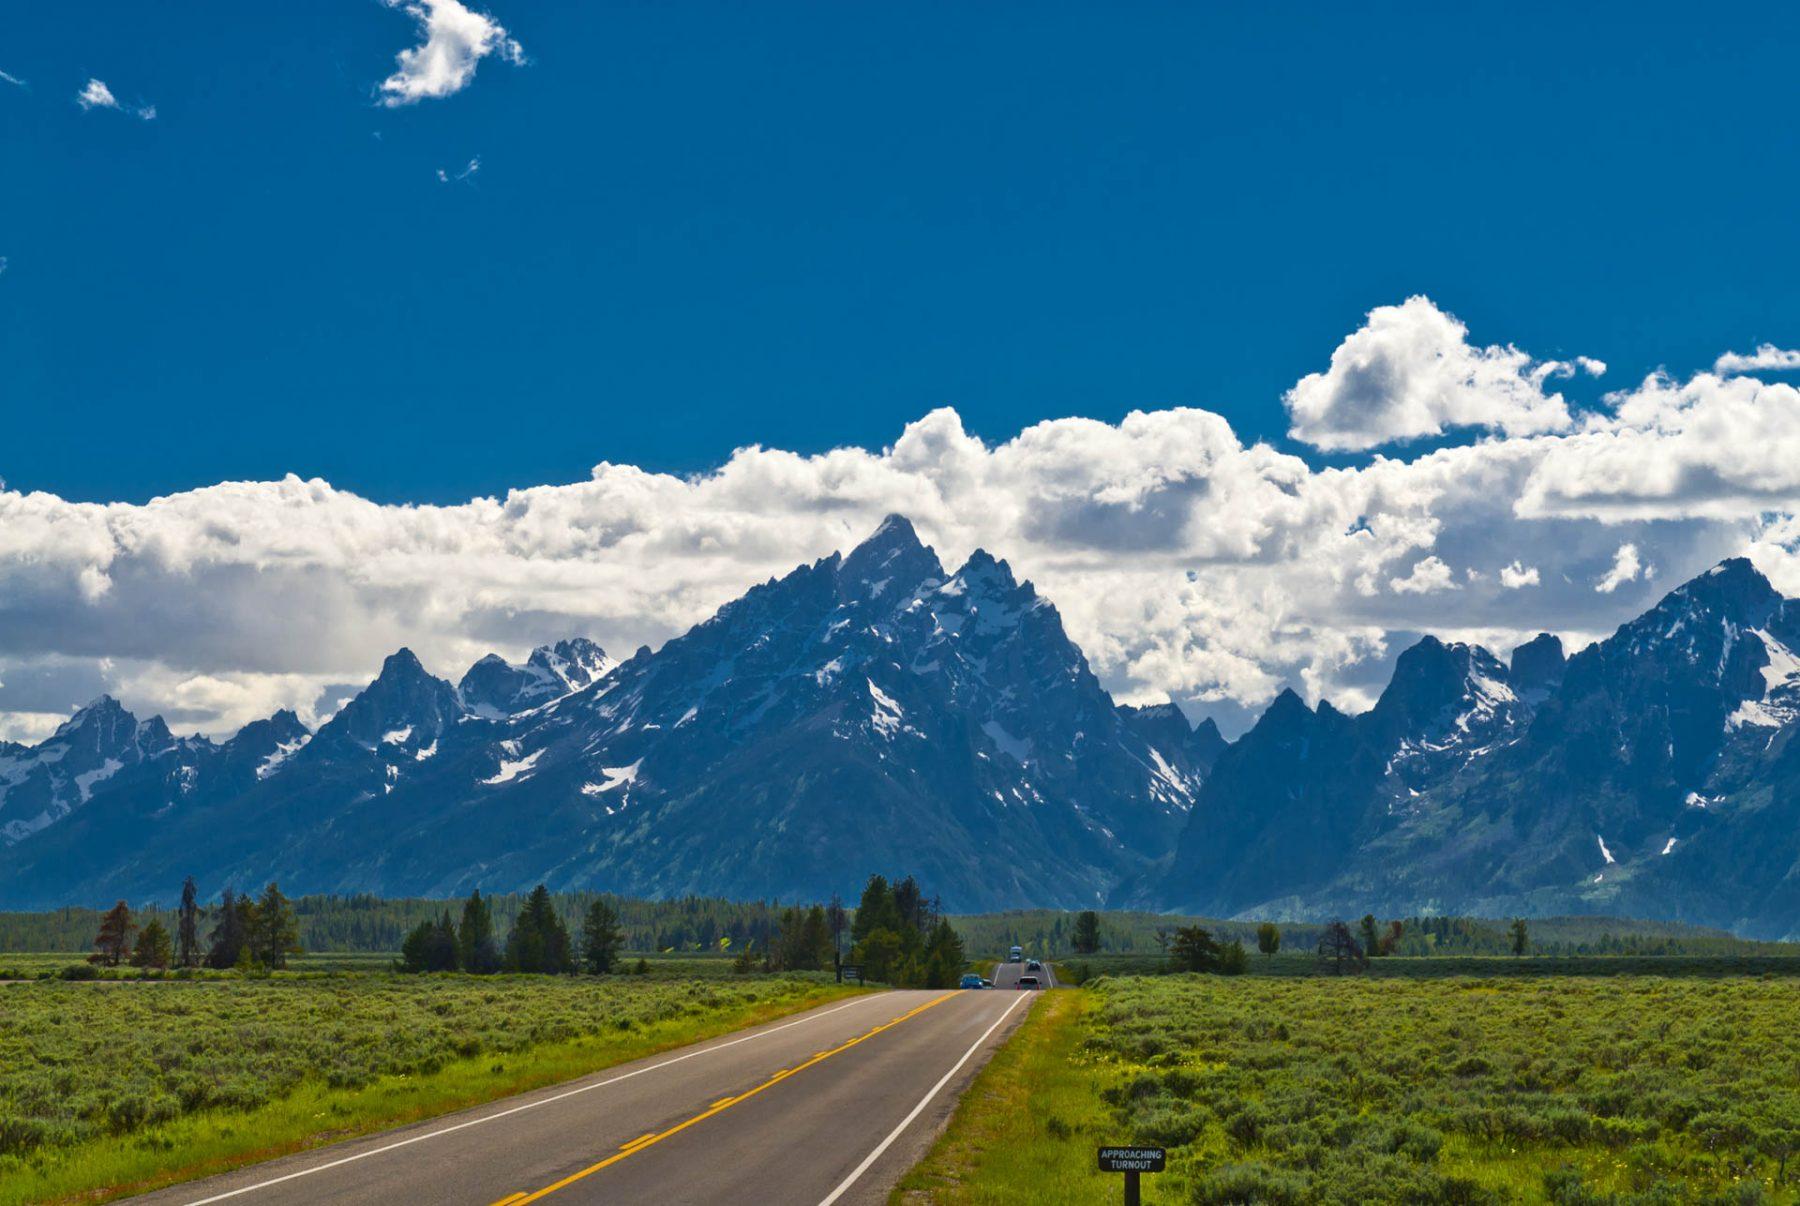 Teton_Scenic_Highway